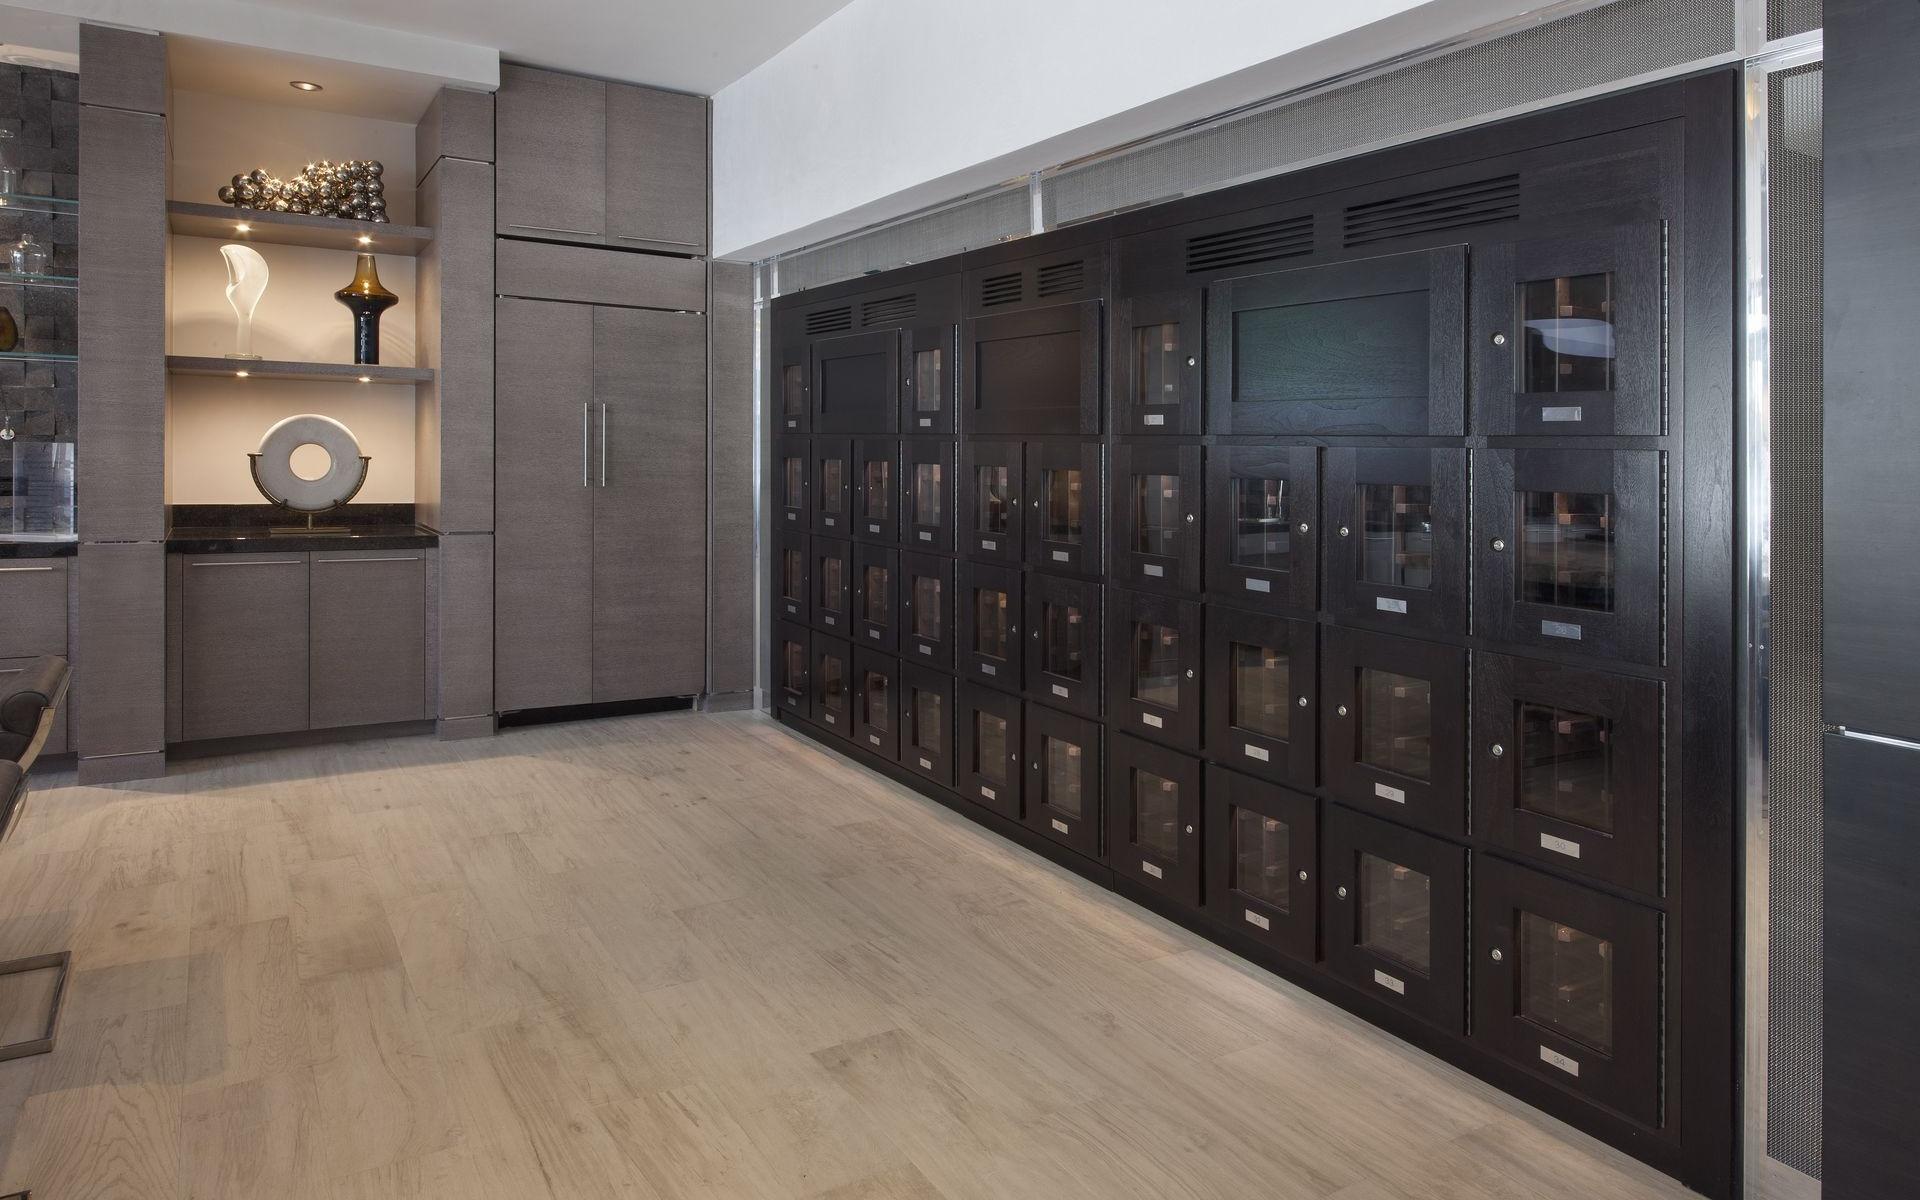 welles hardwood flooring reviews of map neighborhood monarc at met luxury miami apartments within dynamic asp